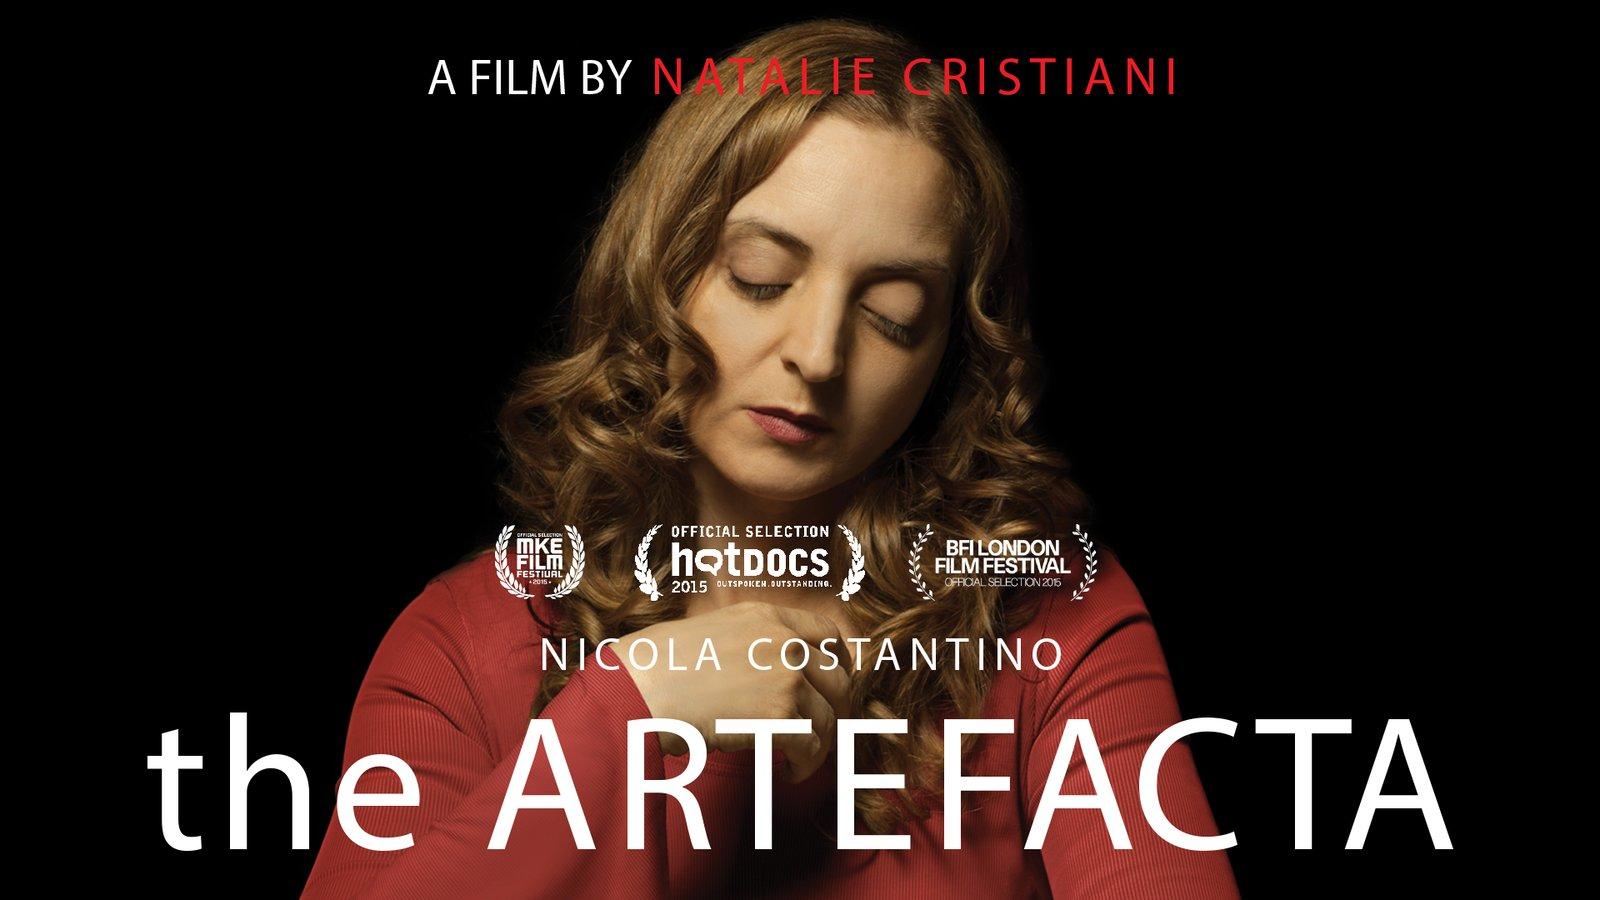 The Artefacta - The Art of Nicola Costantino